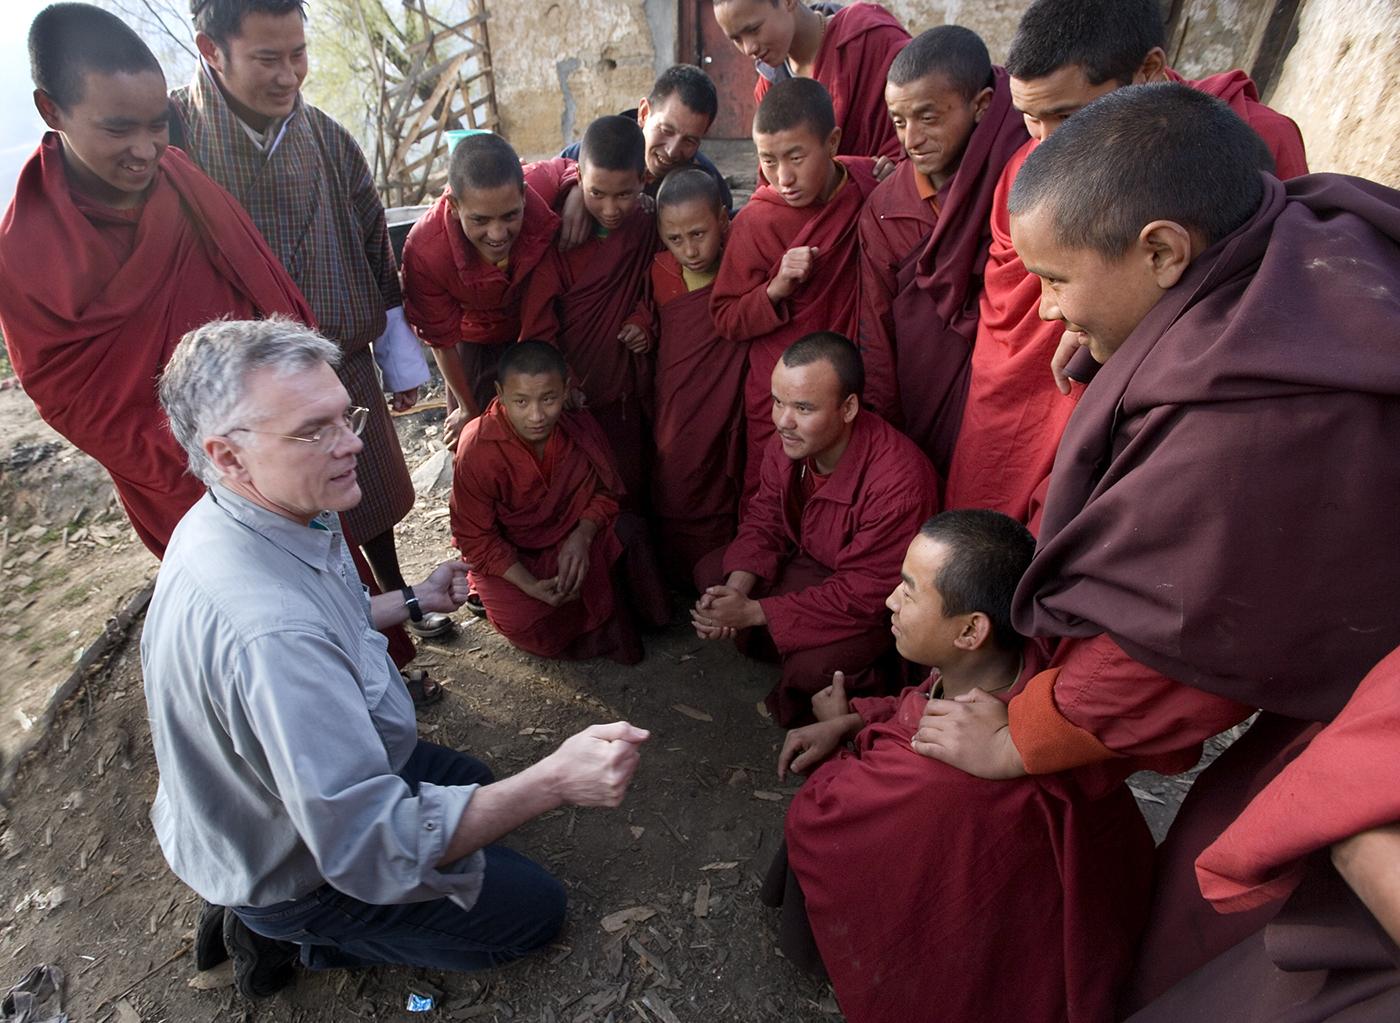 rick sammon monks 2.jpg